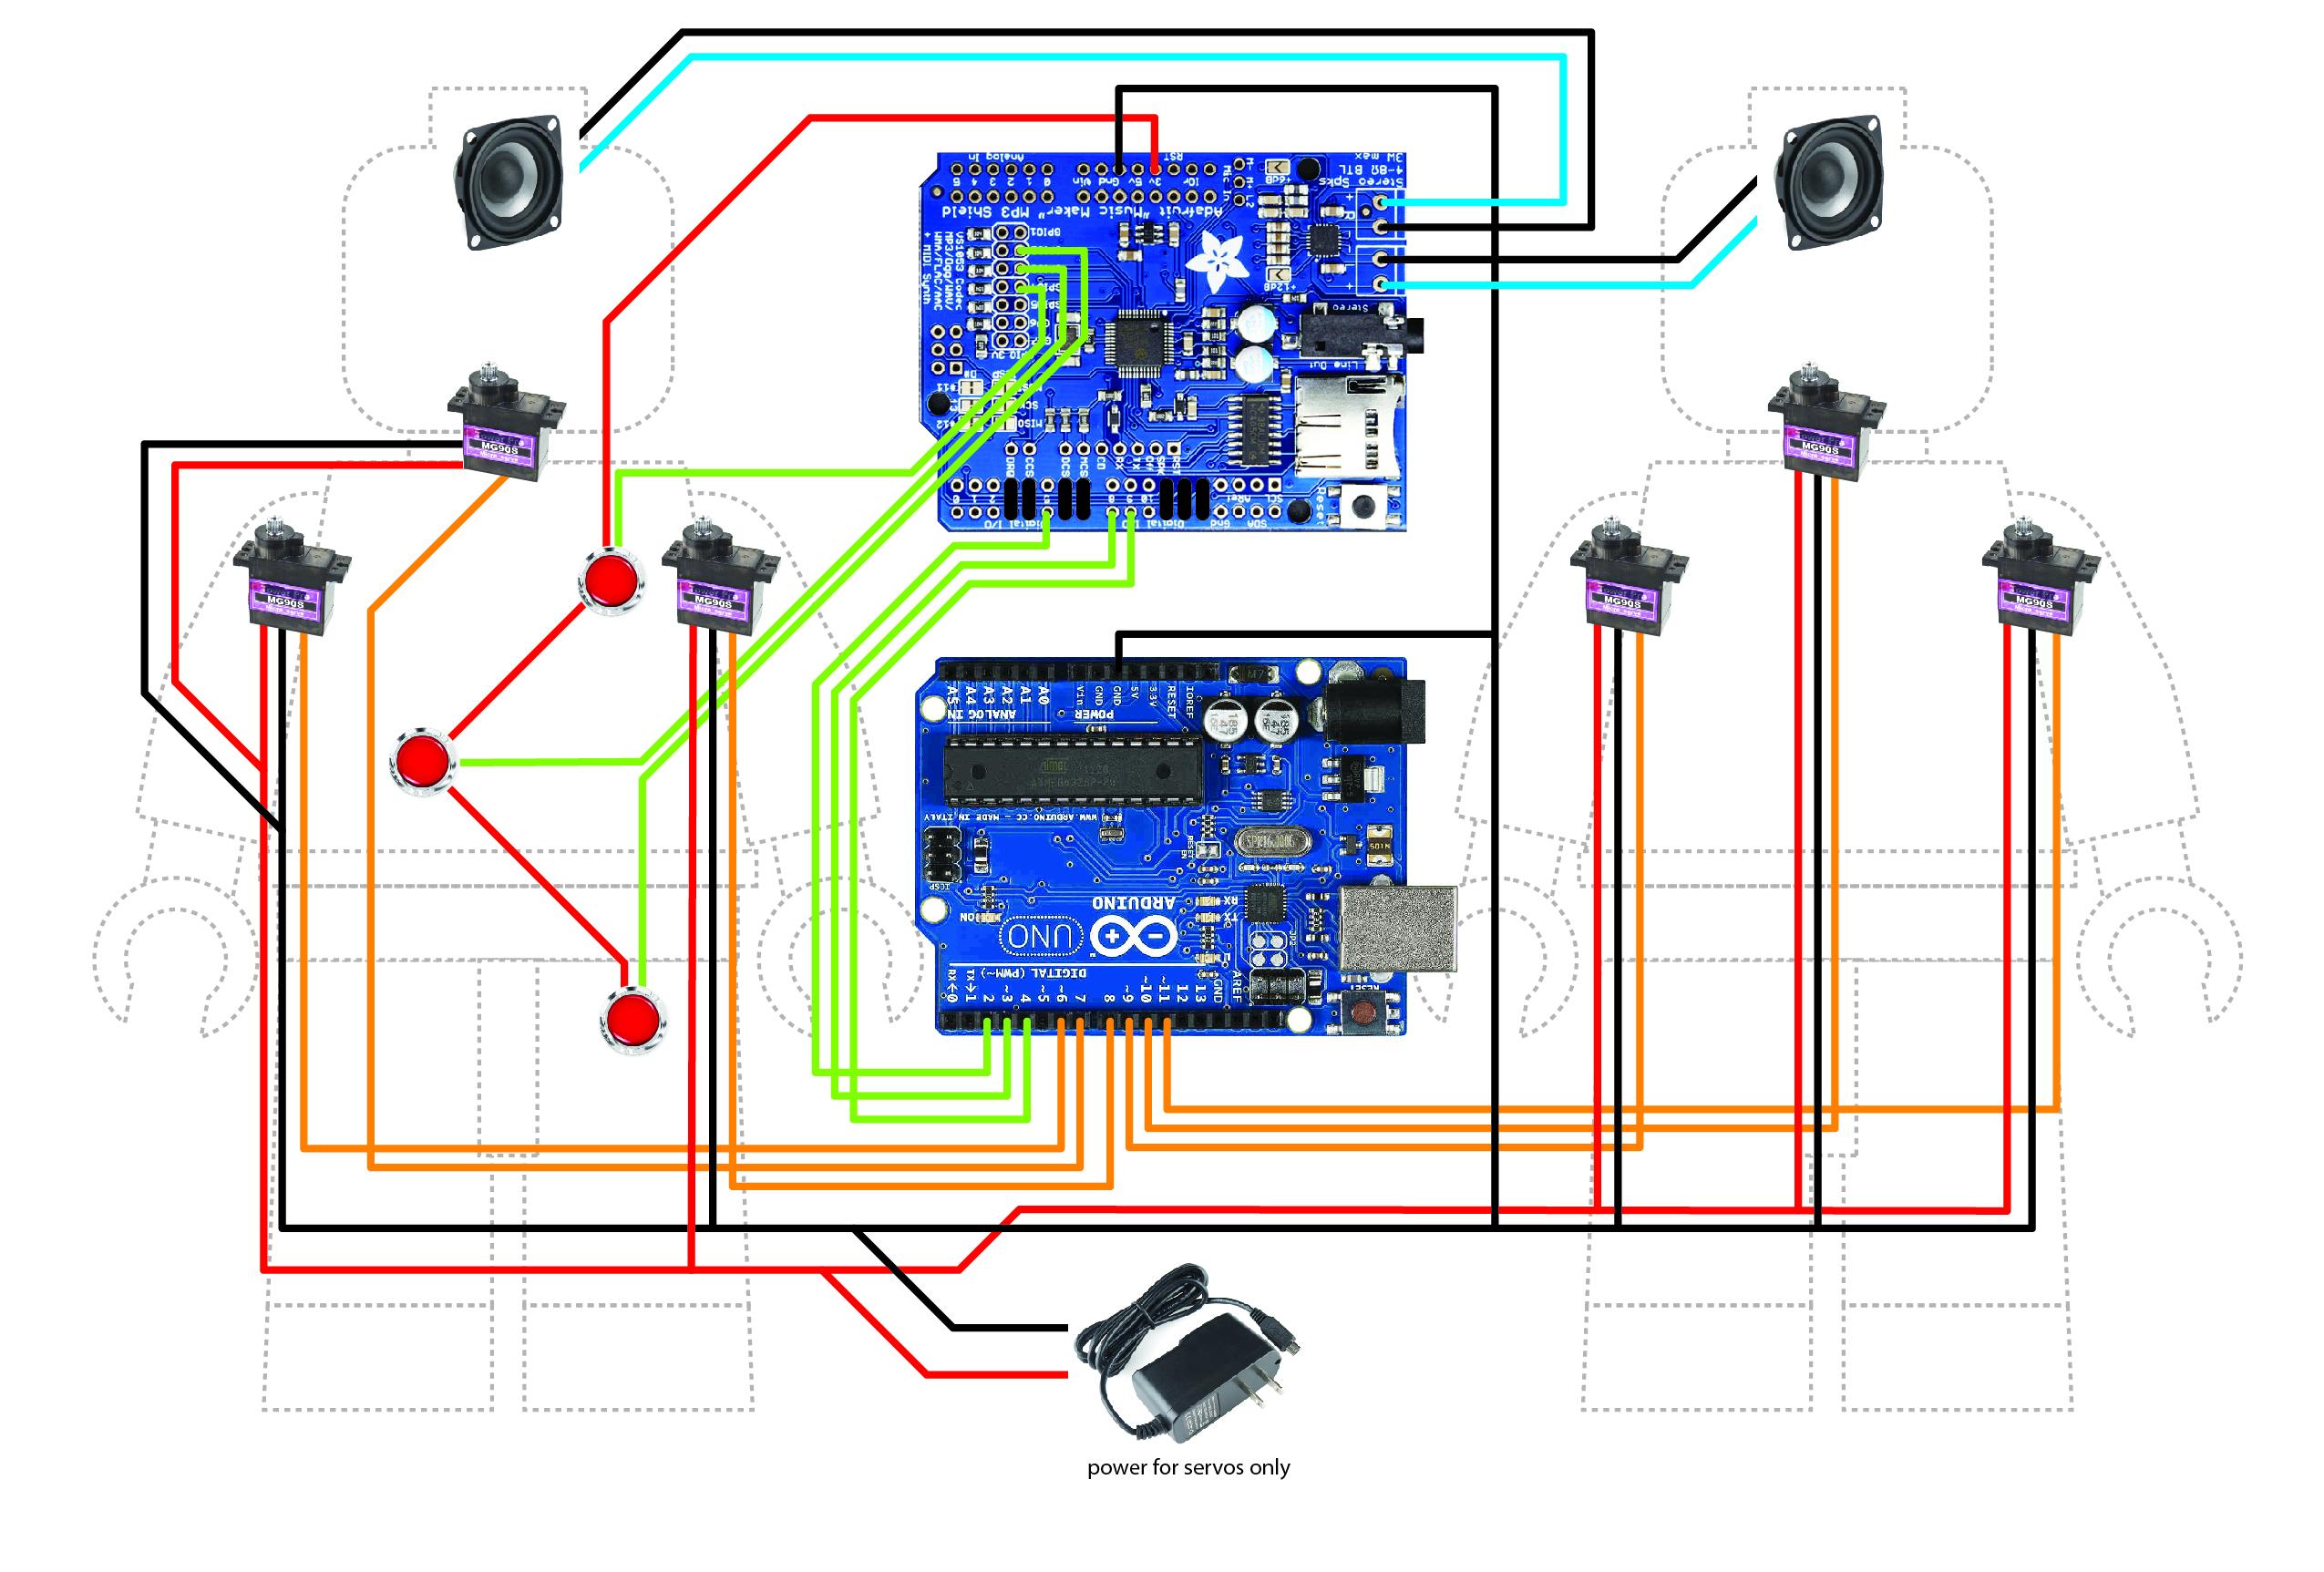 on x carve arduino uno wiring diagram